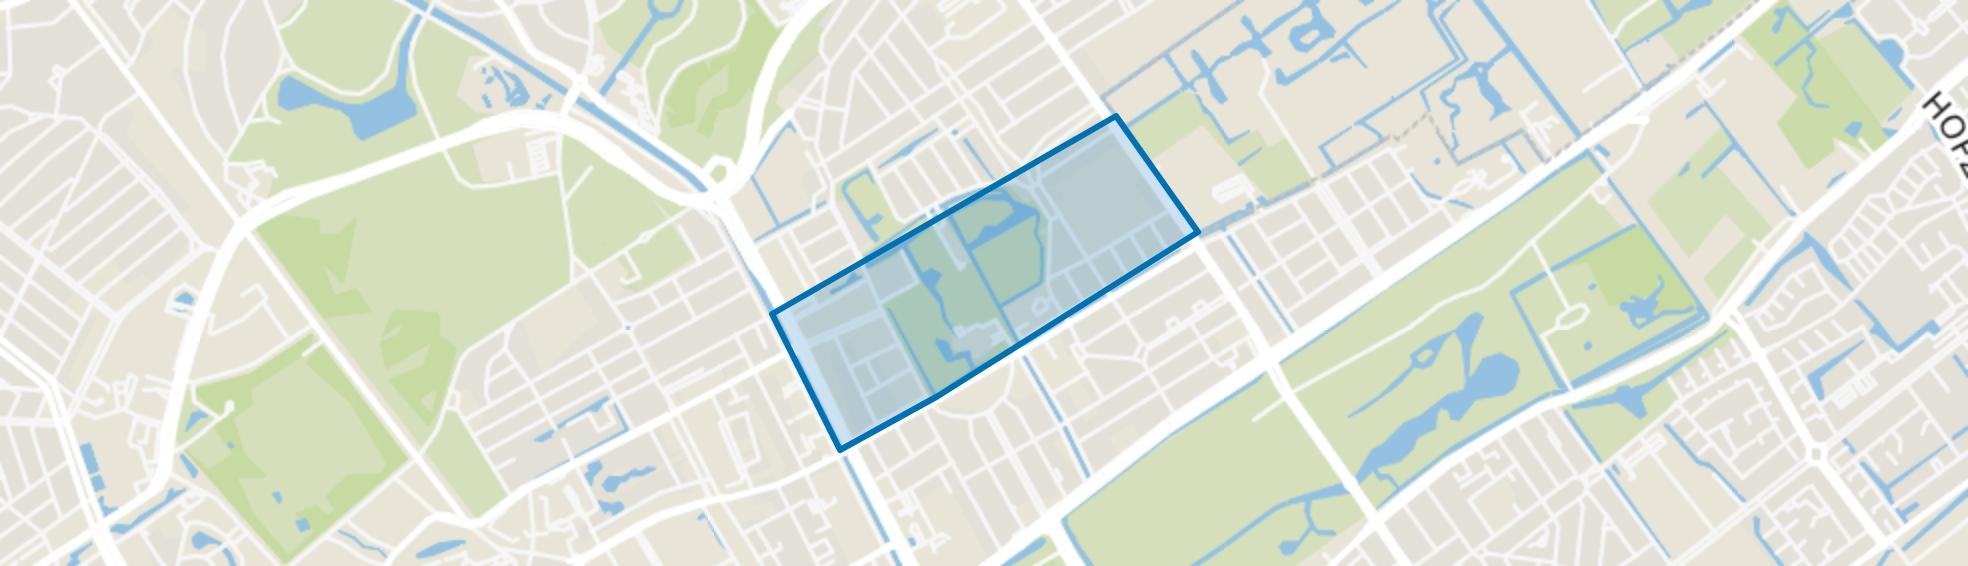 Arendsdorp, Den Haag map